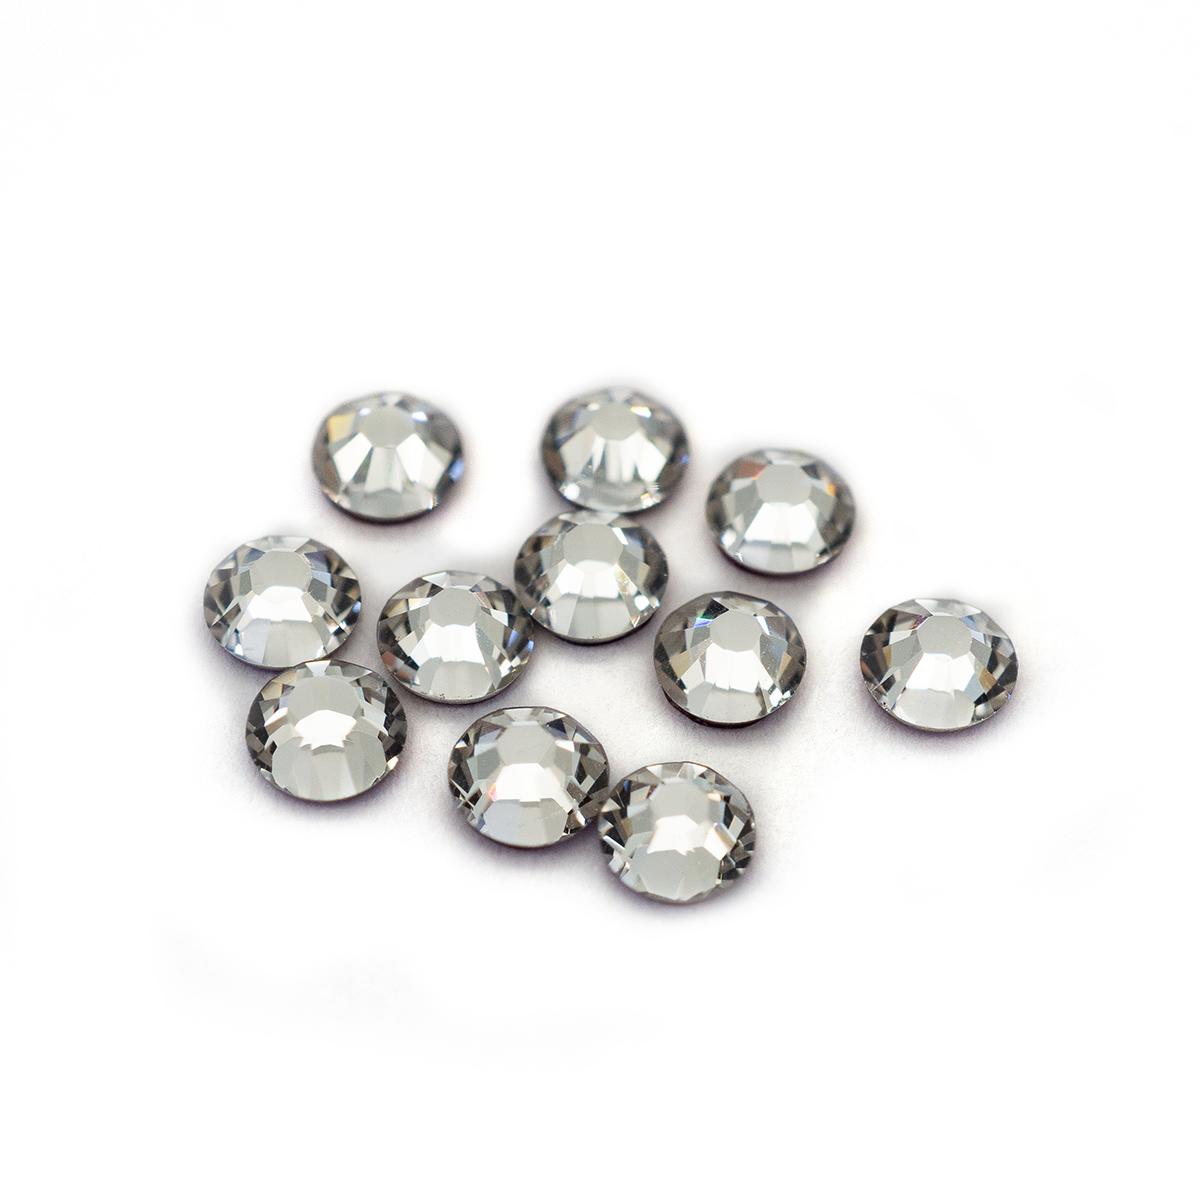 Камни плоские с клеем 2038/E SS 10 (1) кристалл прозр. 50шт. Swarovski